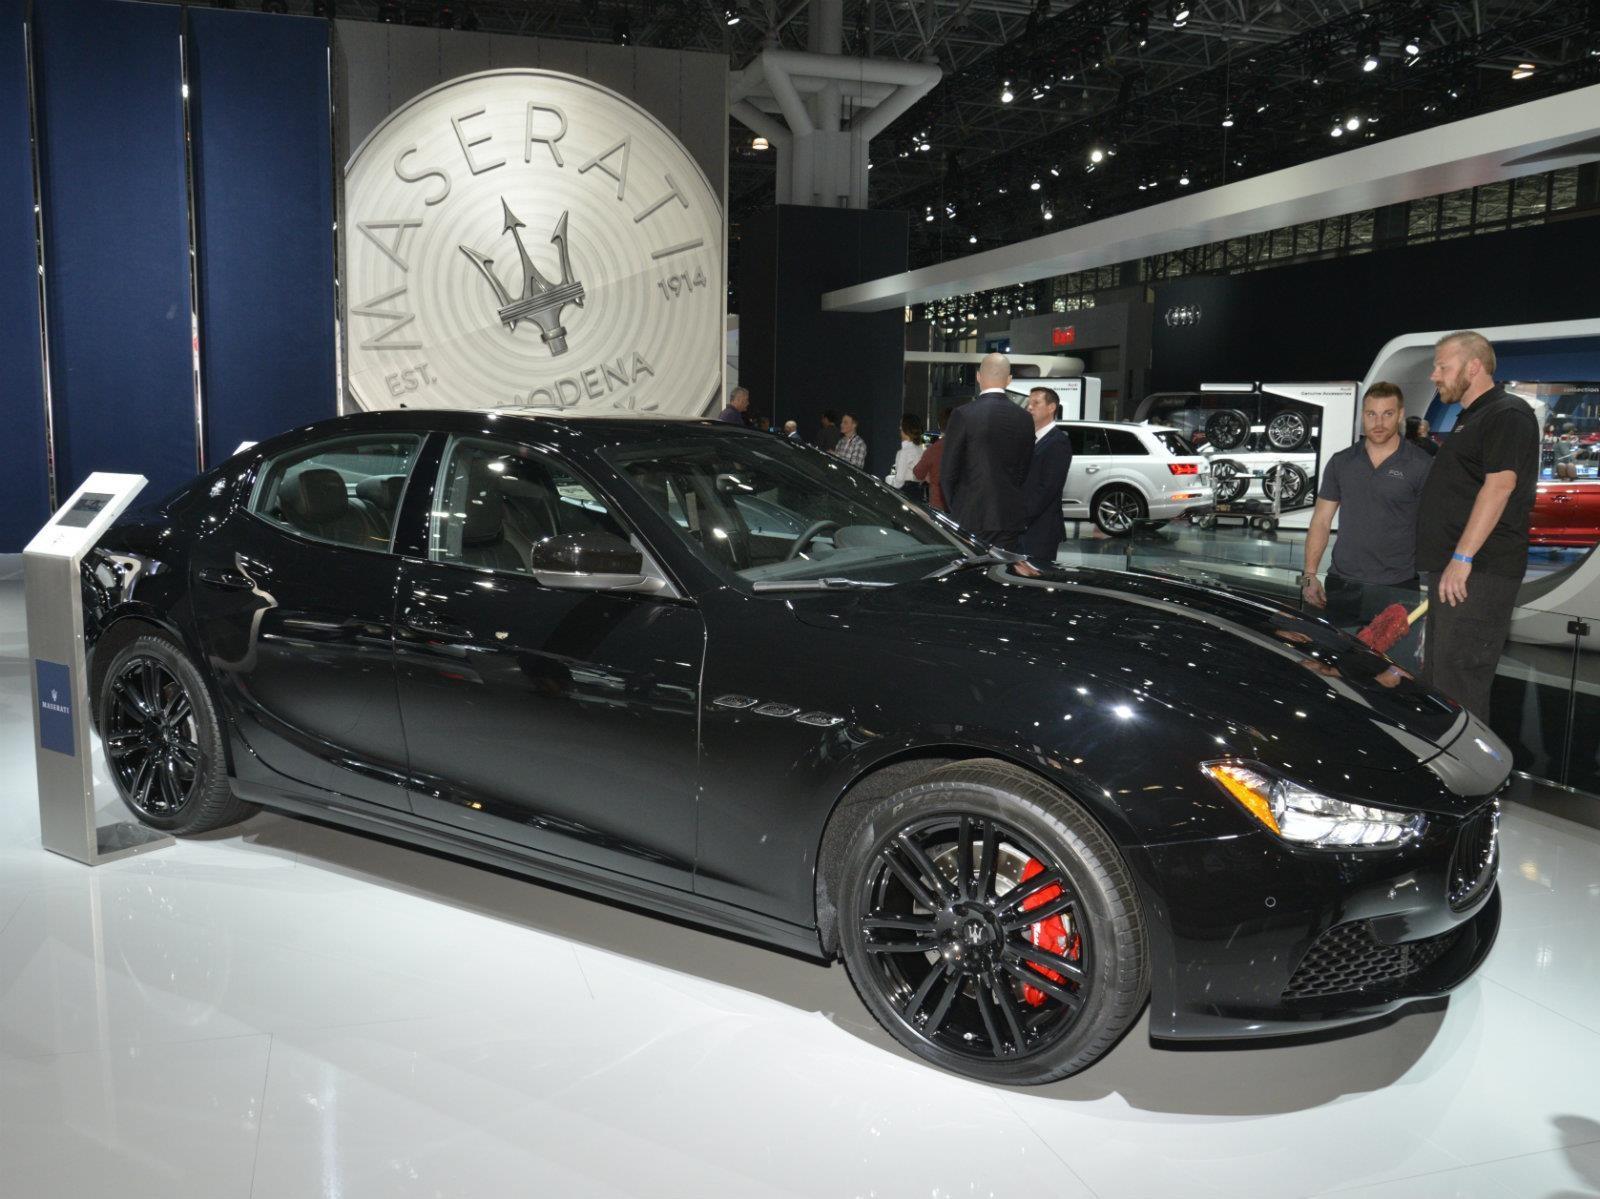 Maserati Ghibli Nerissimo Edition, exclusividad y elegancia